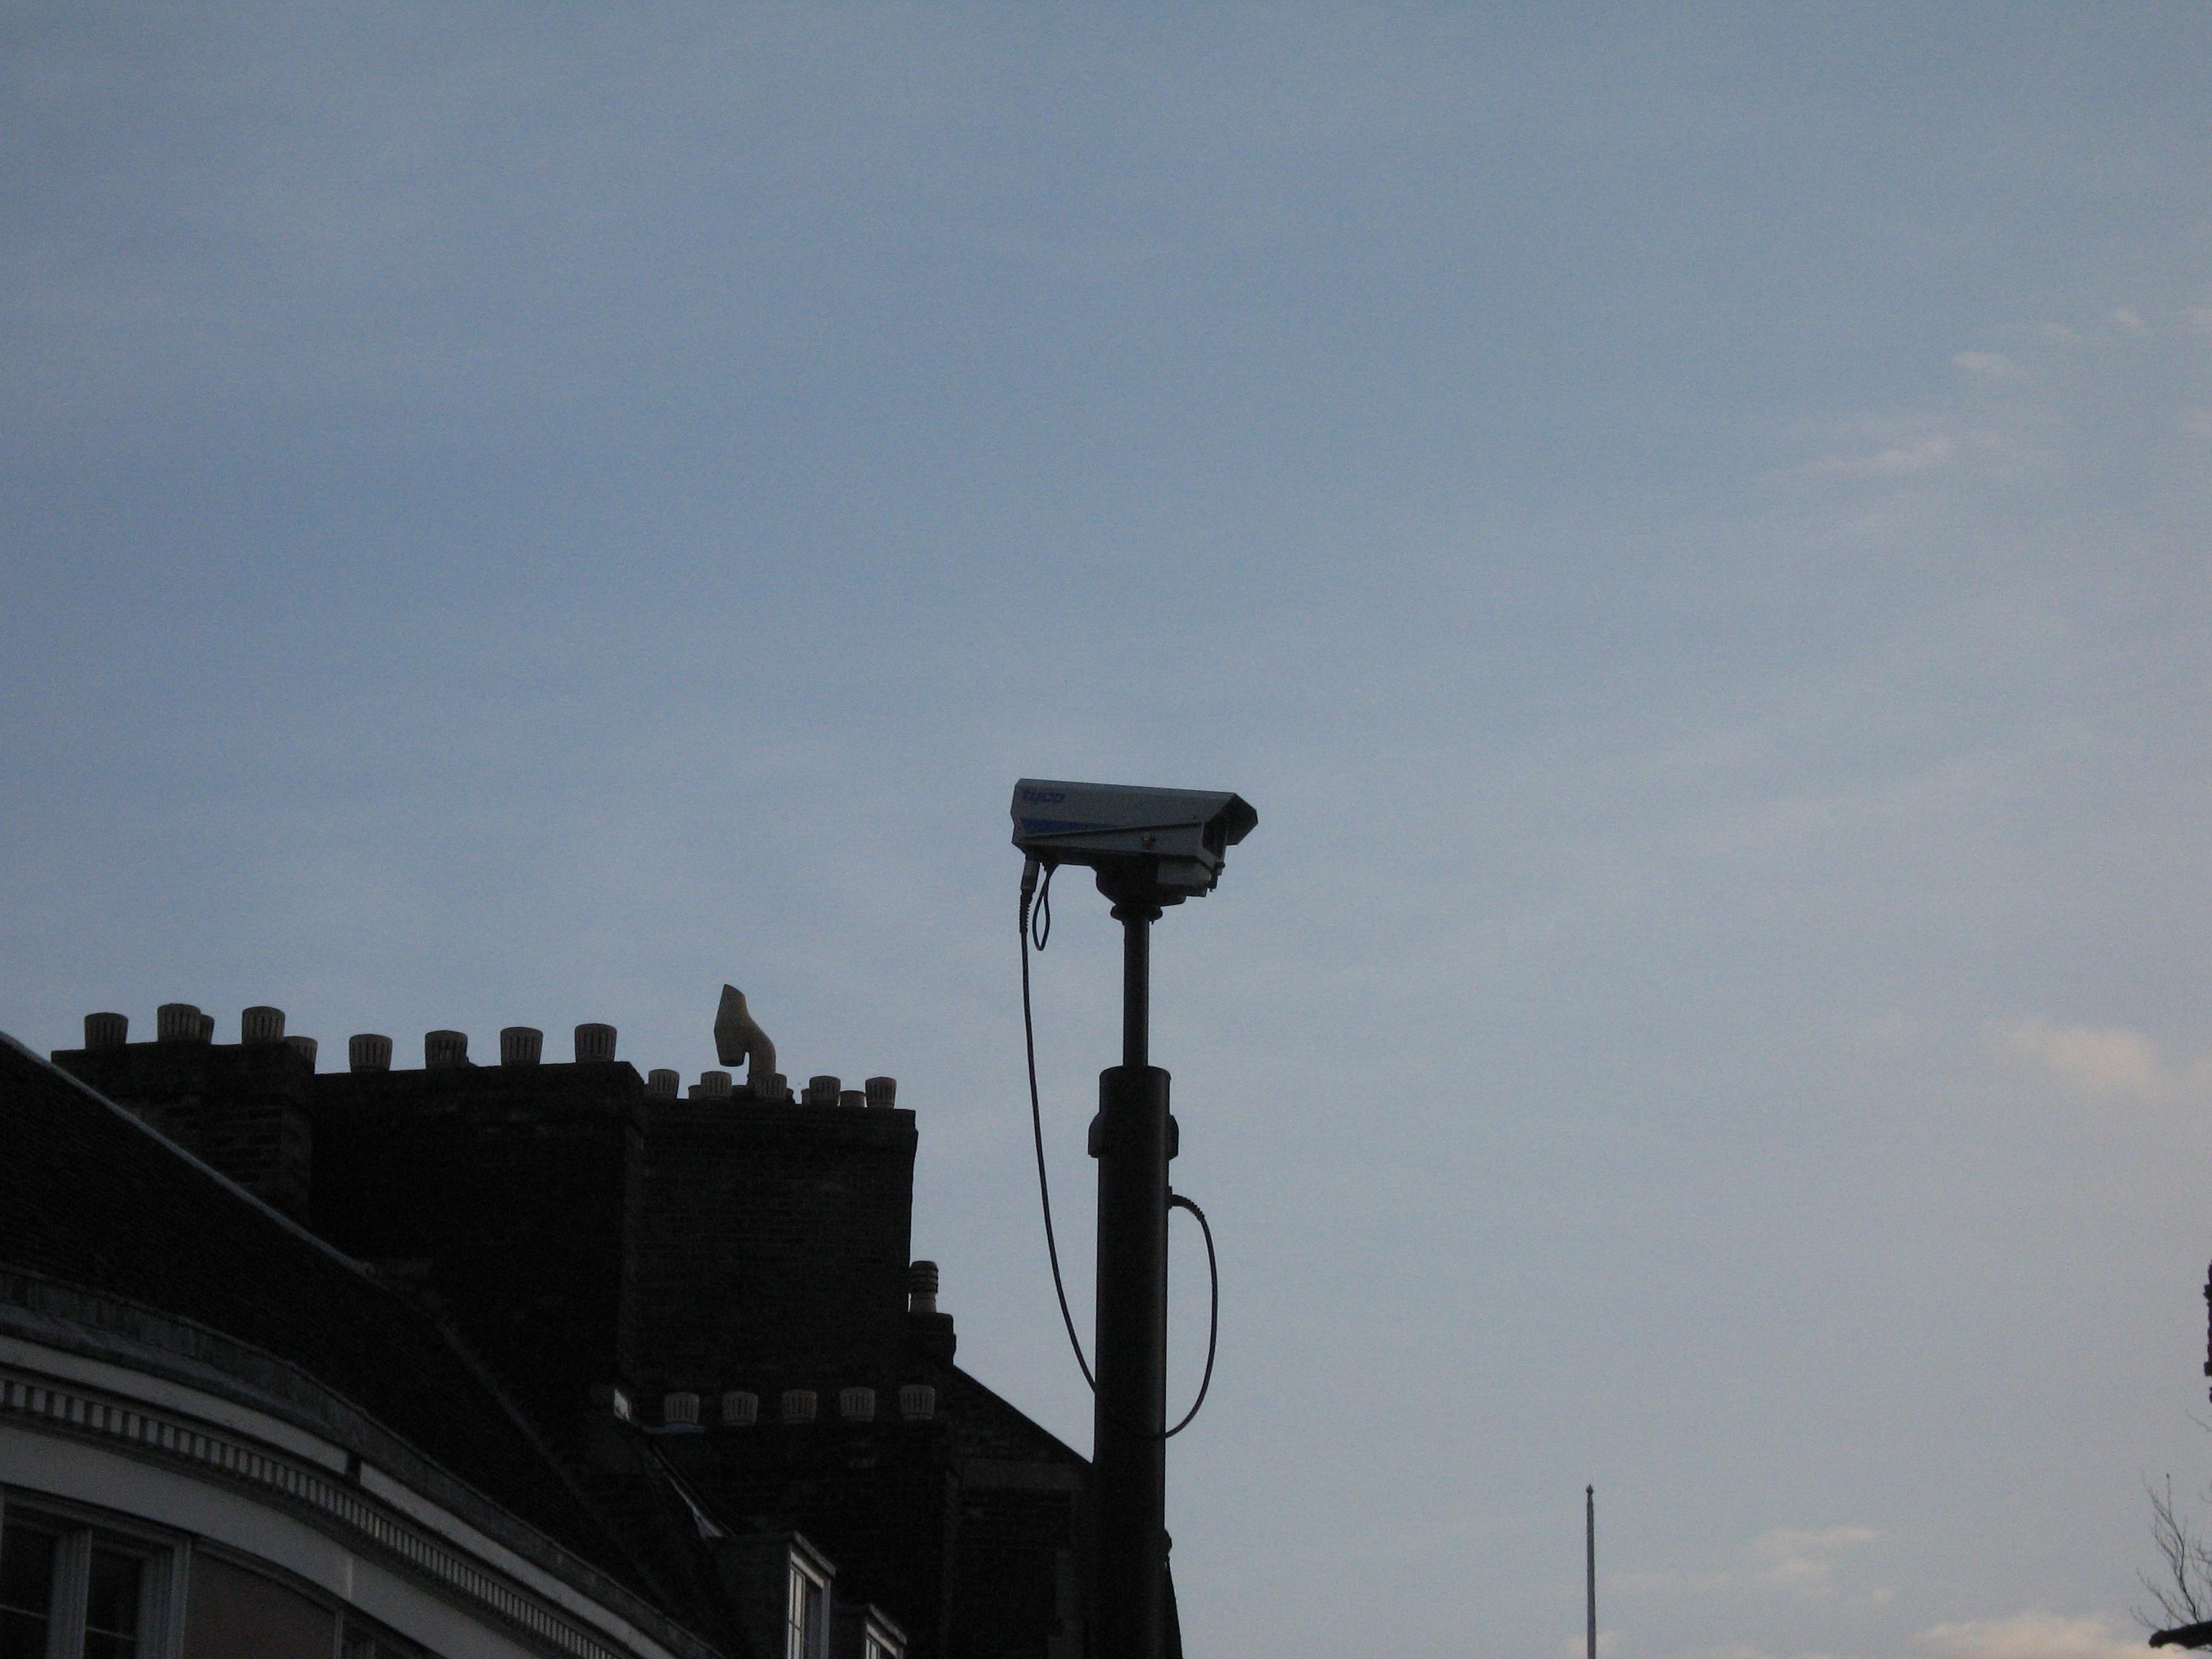 File:cctv Camera on Round